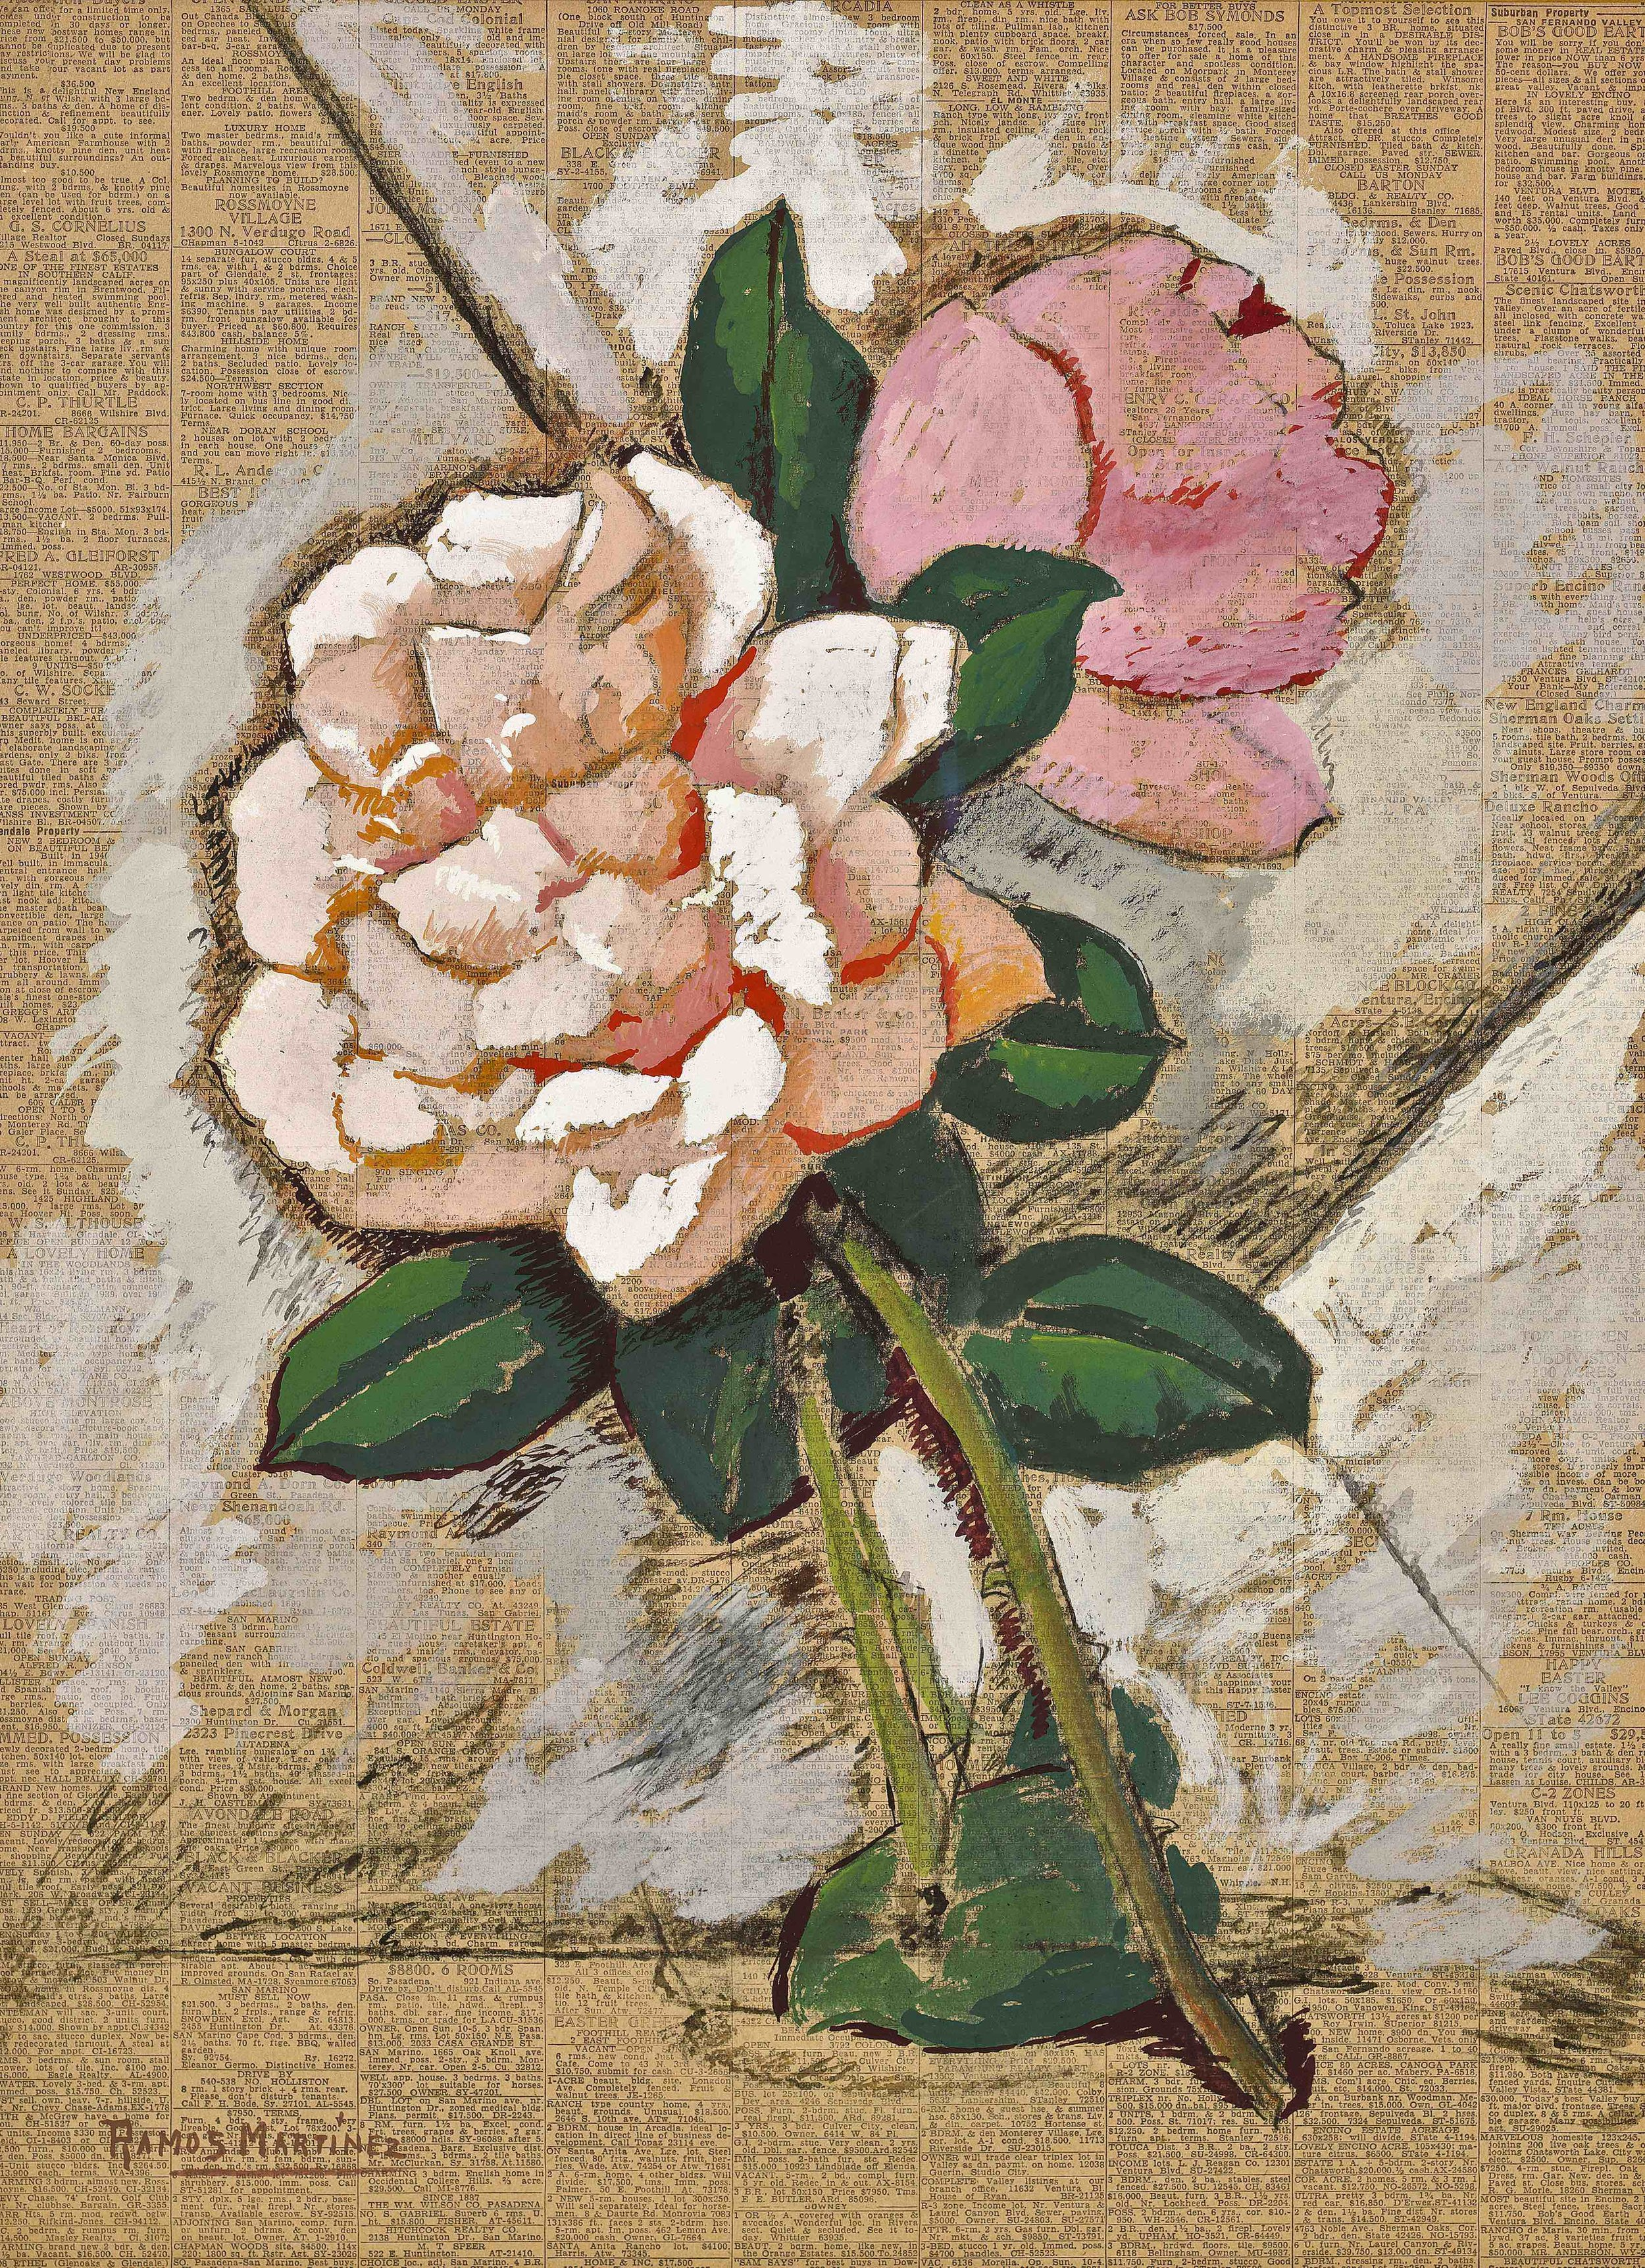 Flores / Blossoms  1946 tempera on newsprint / temple sobre papel periódico 22.5 x 16.5 inches; 57.2 x 41.9 centímetros